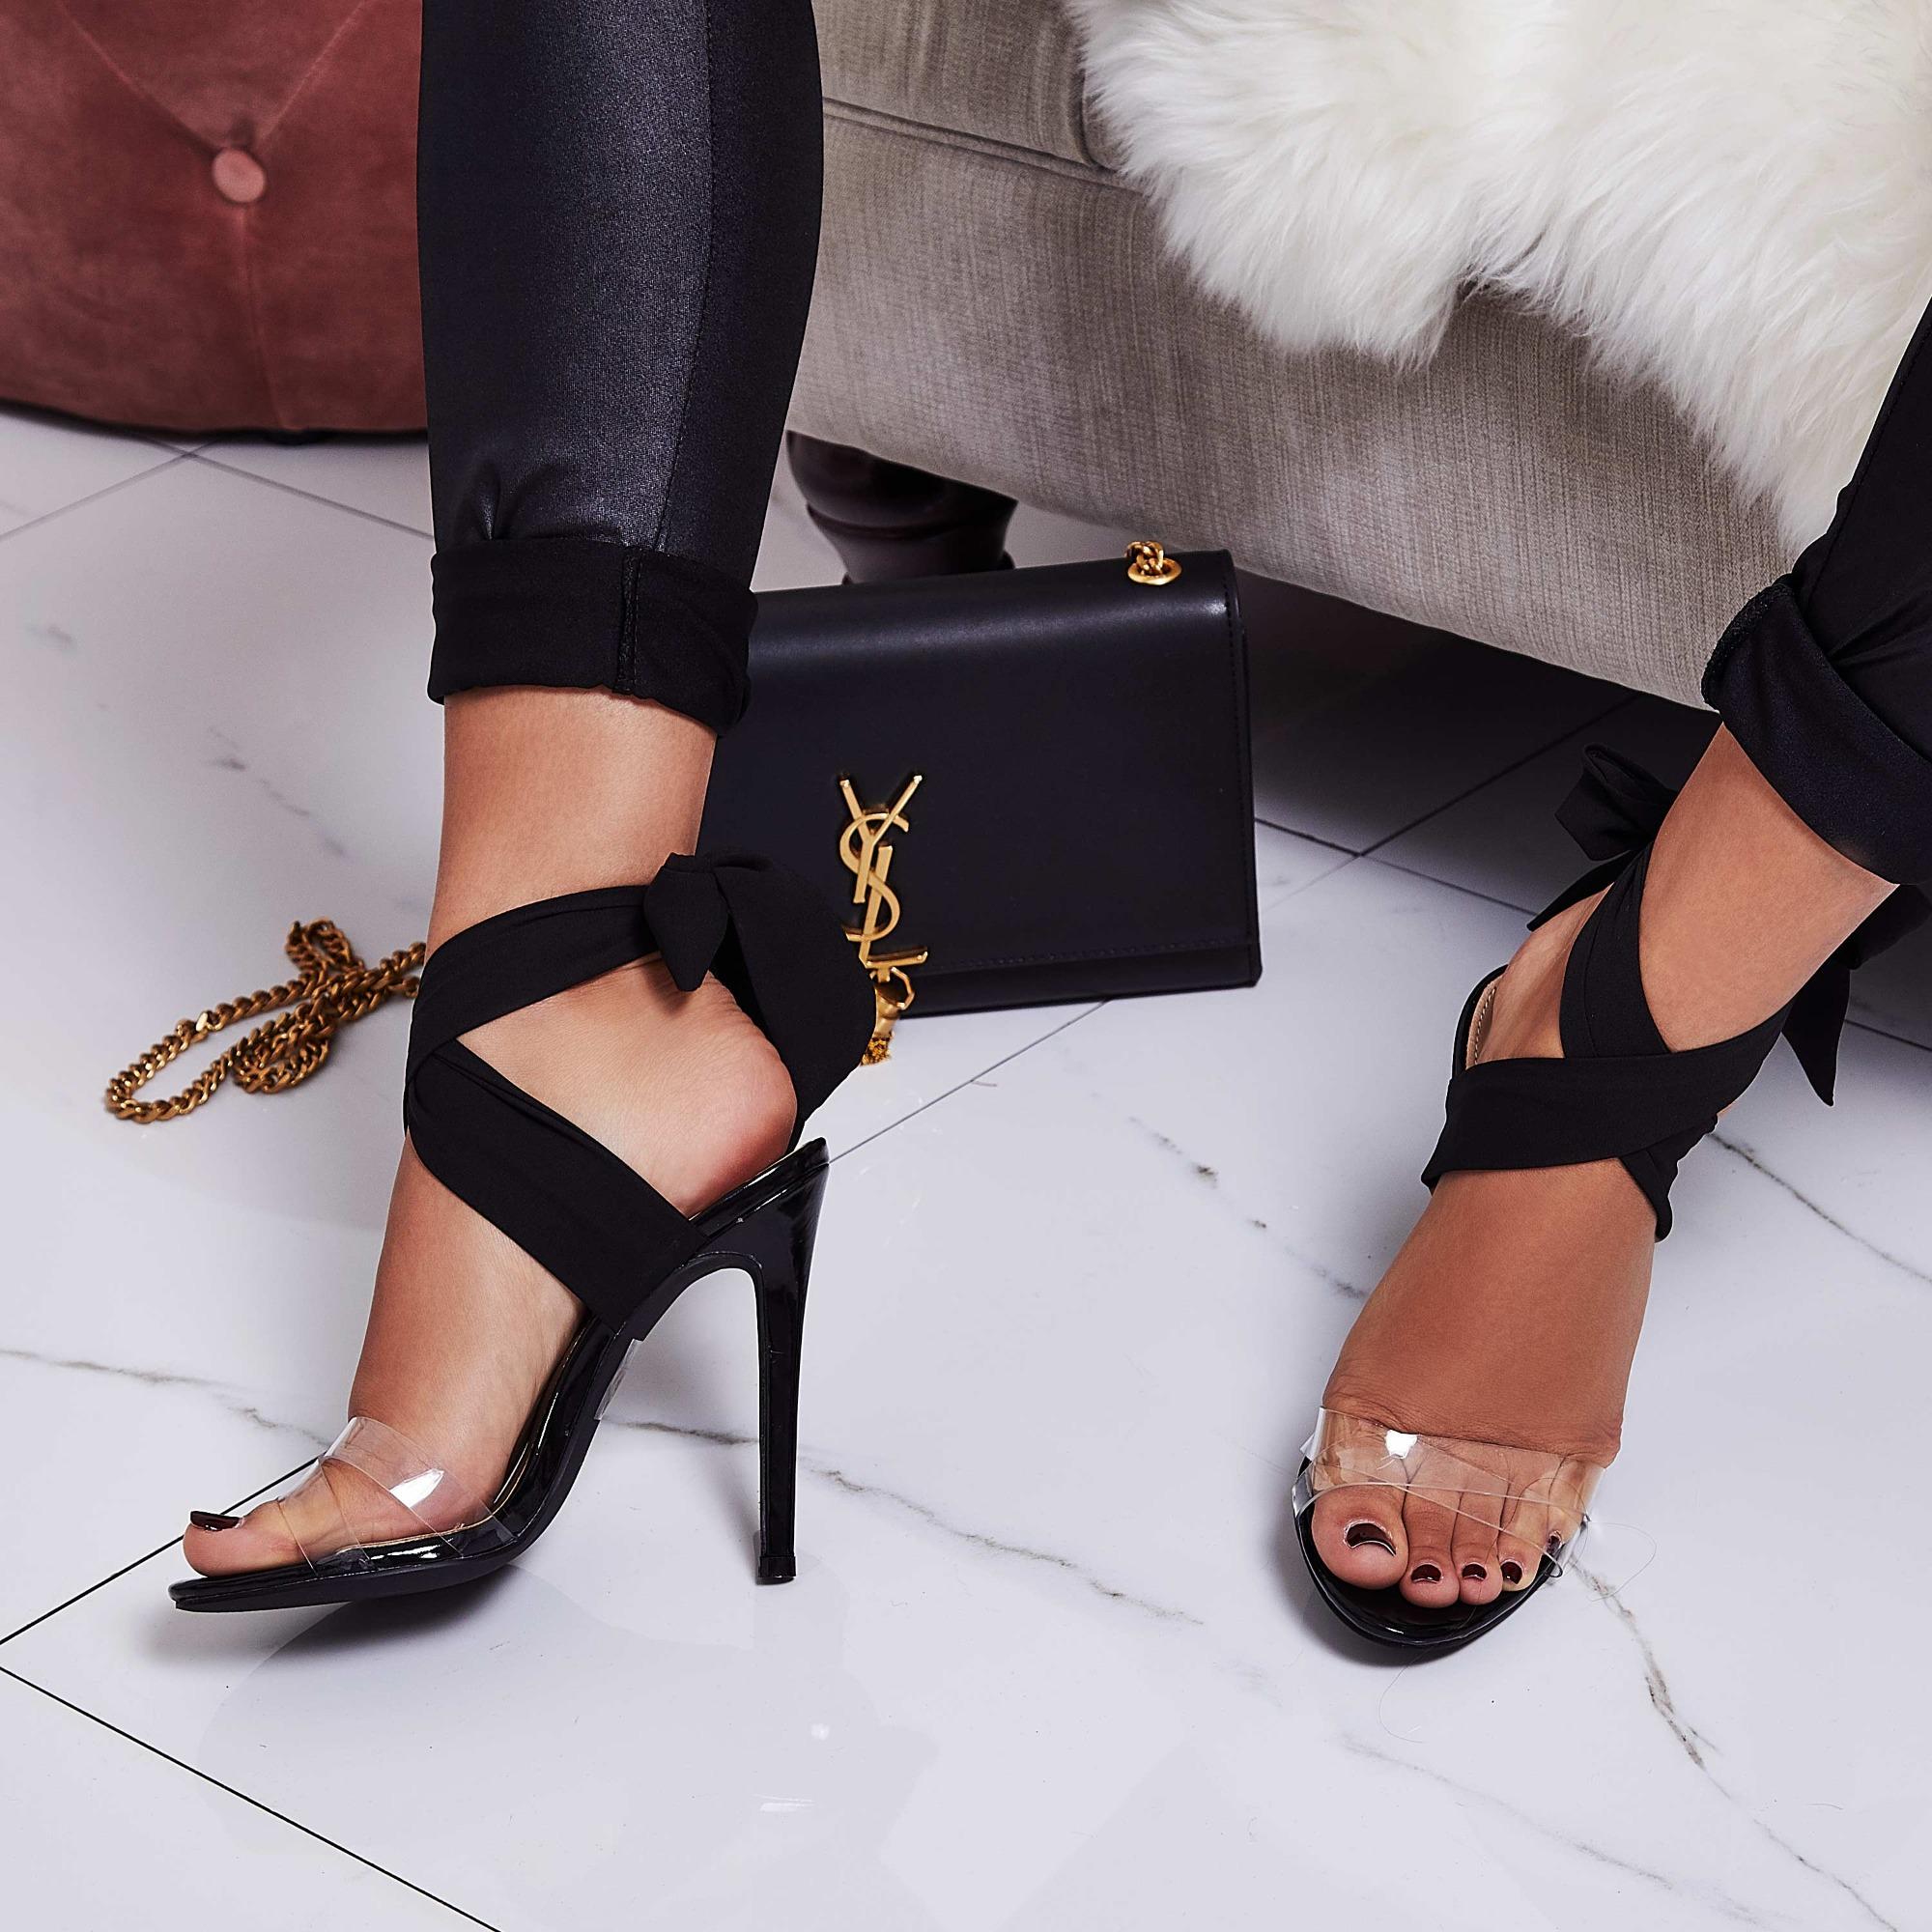 Zabi Ribbon Lace Up Perspex Heel In Black Pat